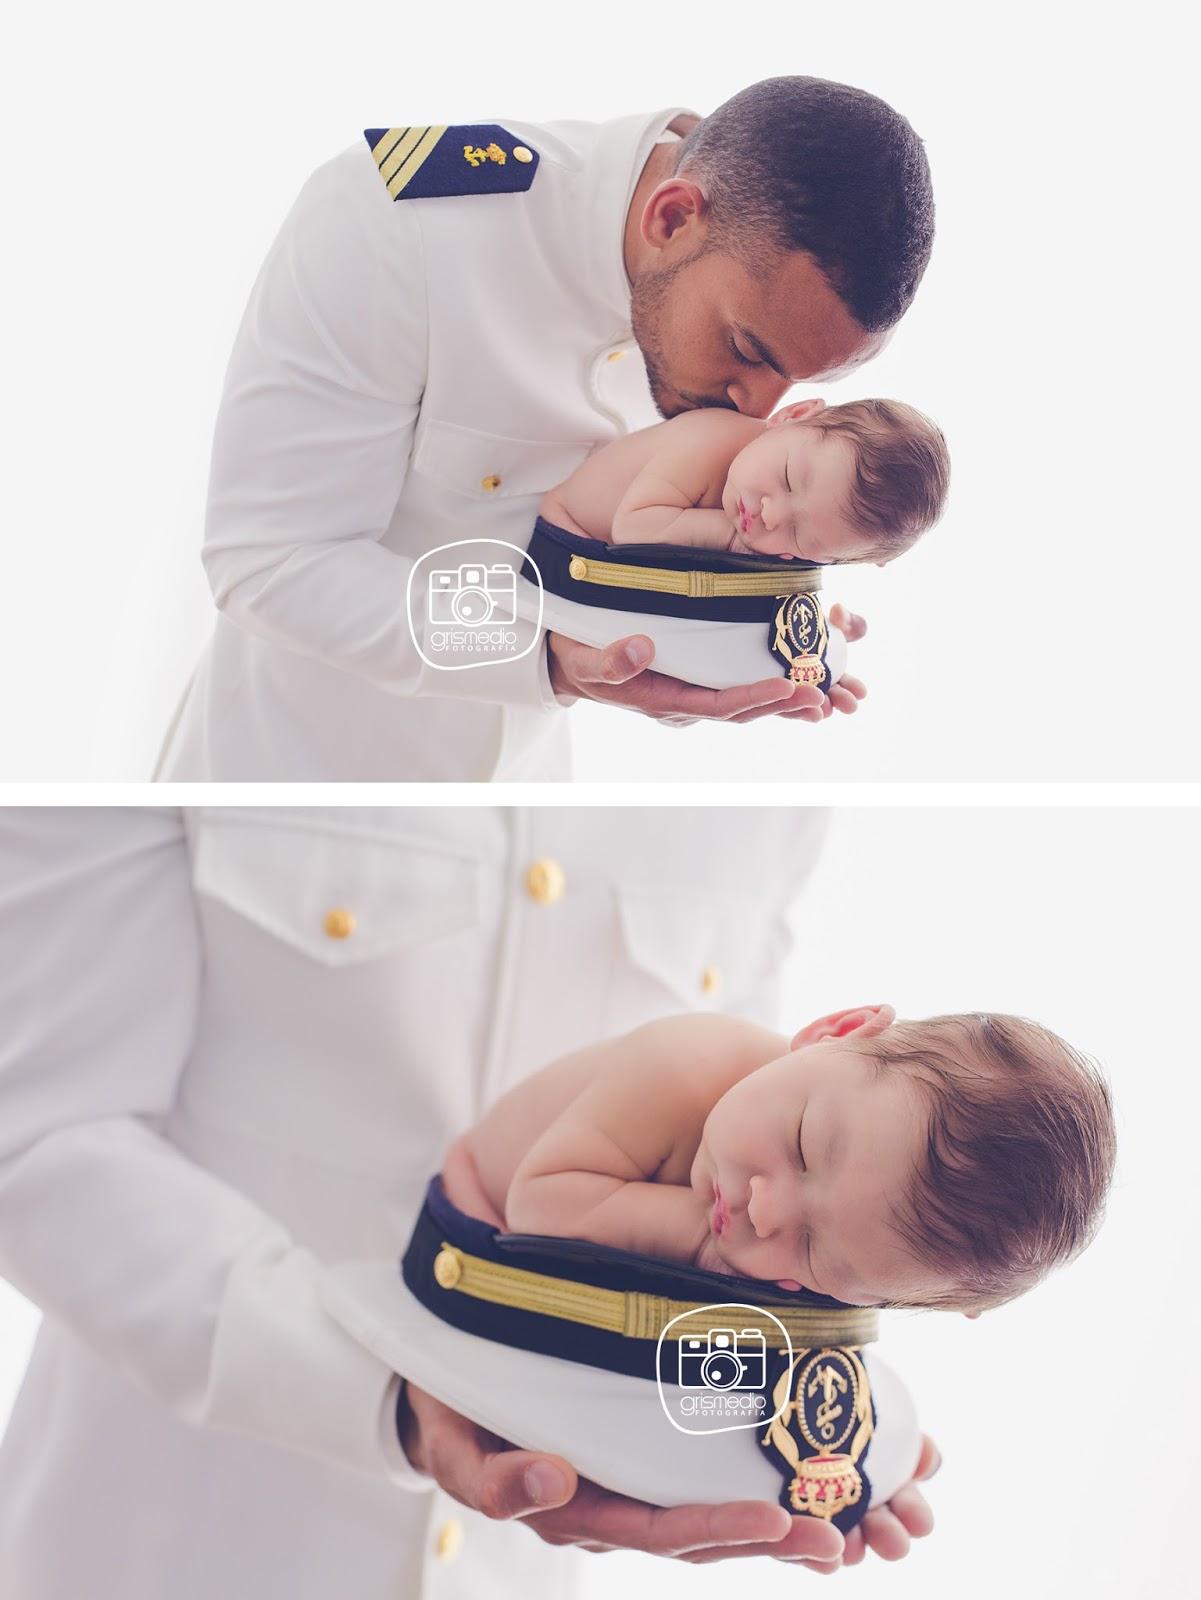 fotografia-especializada-recien-nacido-en-zaragoza-uniformes